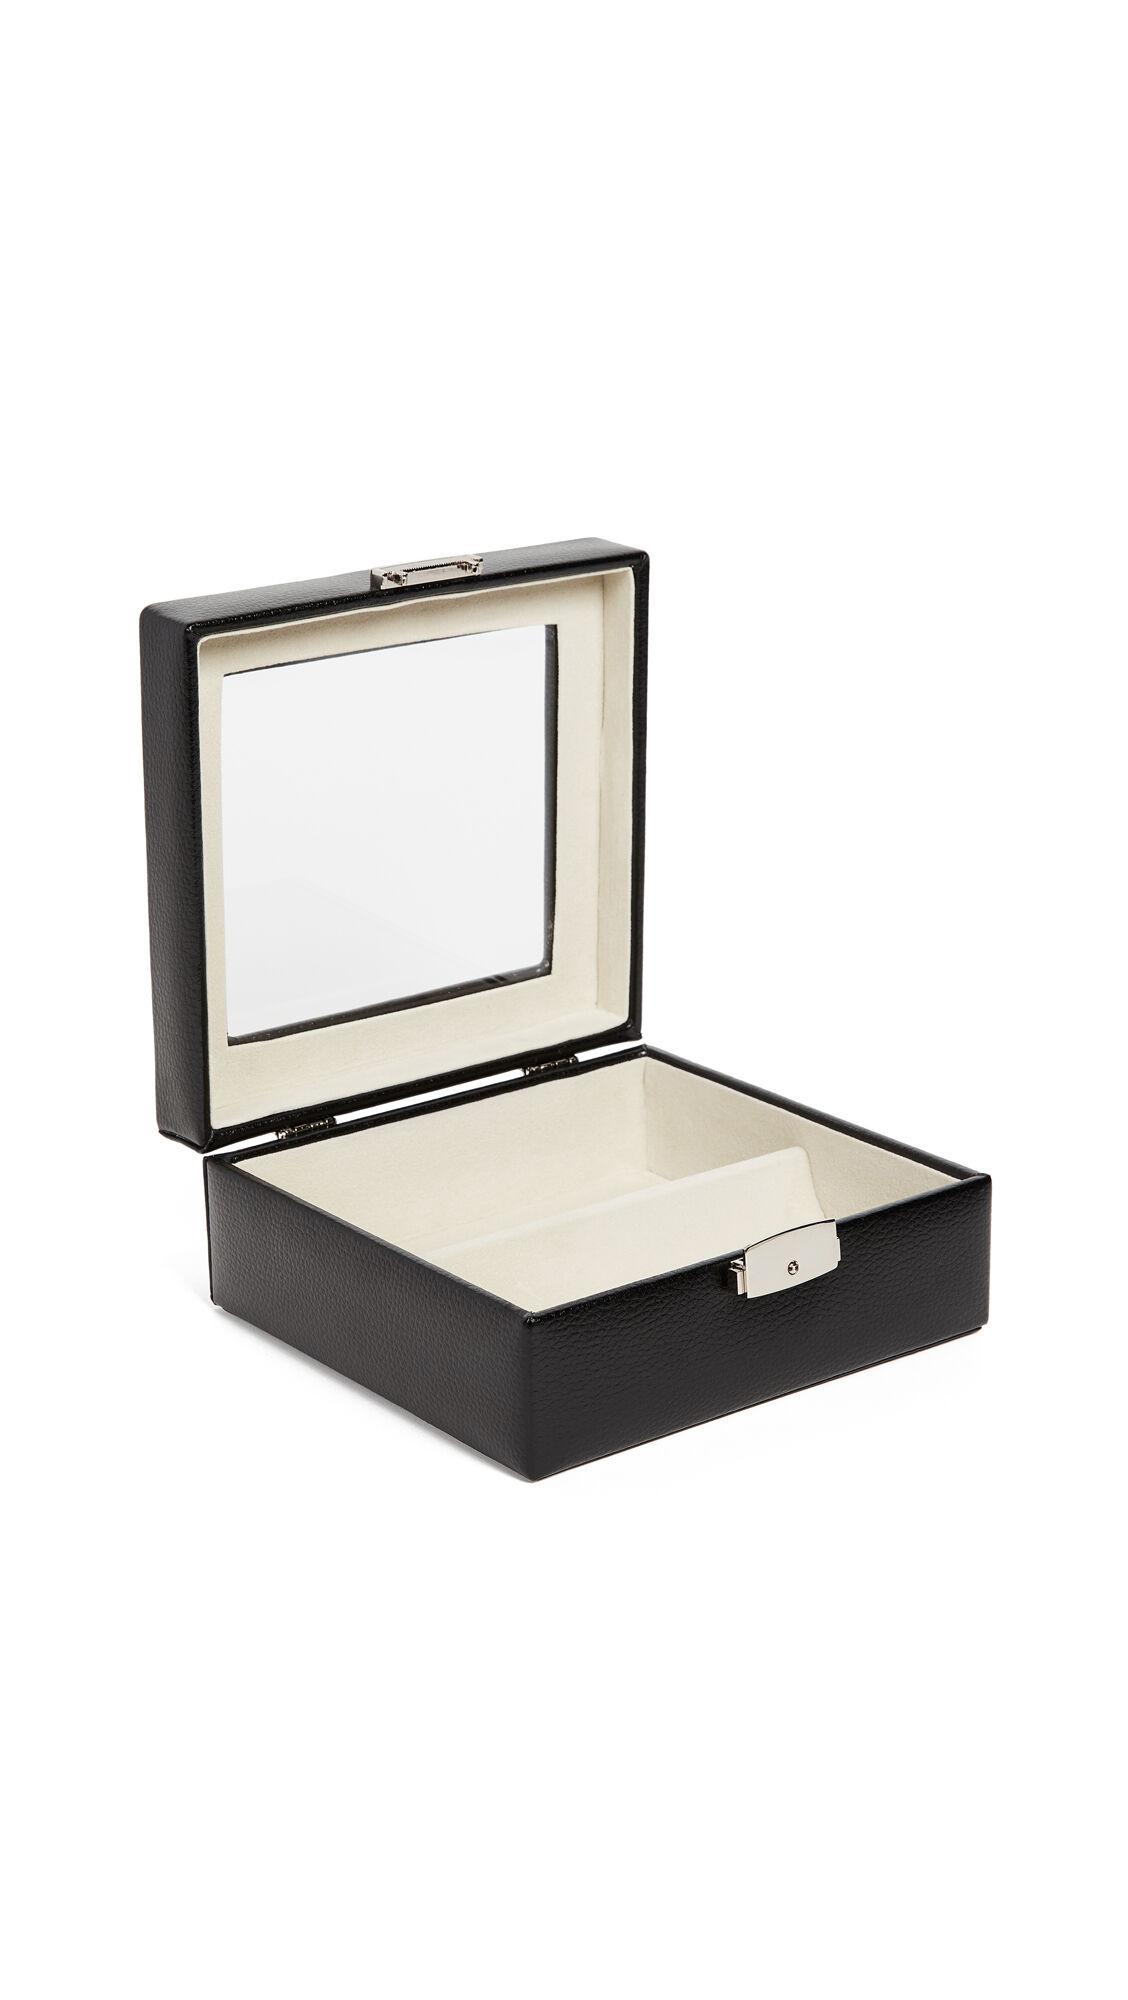 Shopbop Home Shopbop @Home Sunglasses Case  - Black - Size: One Size